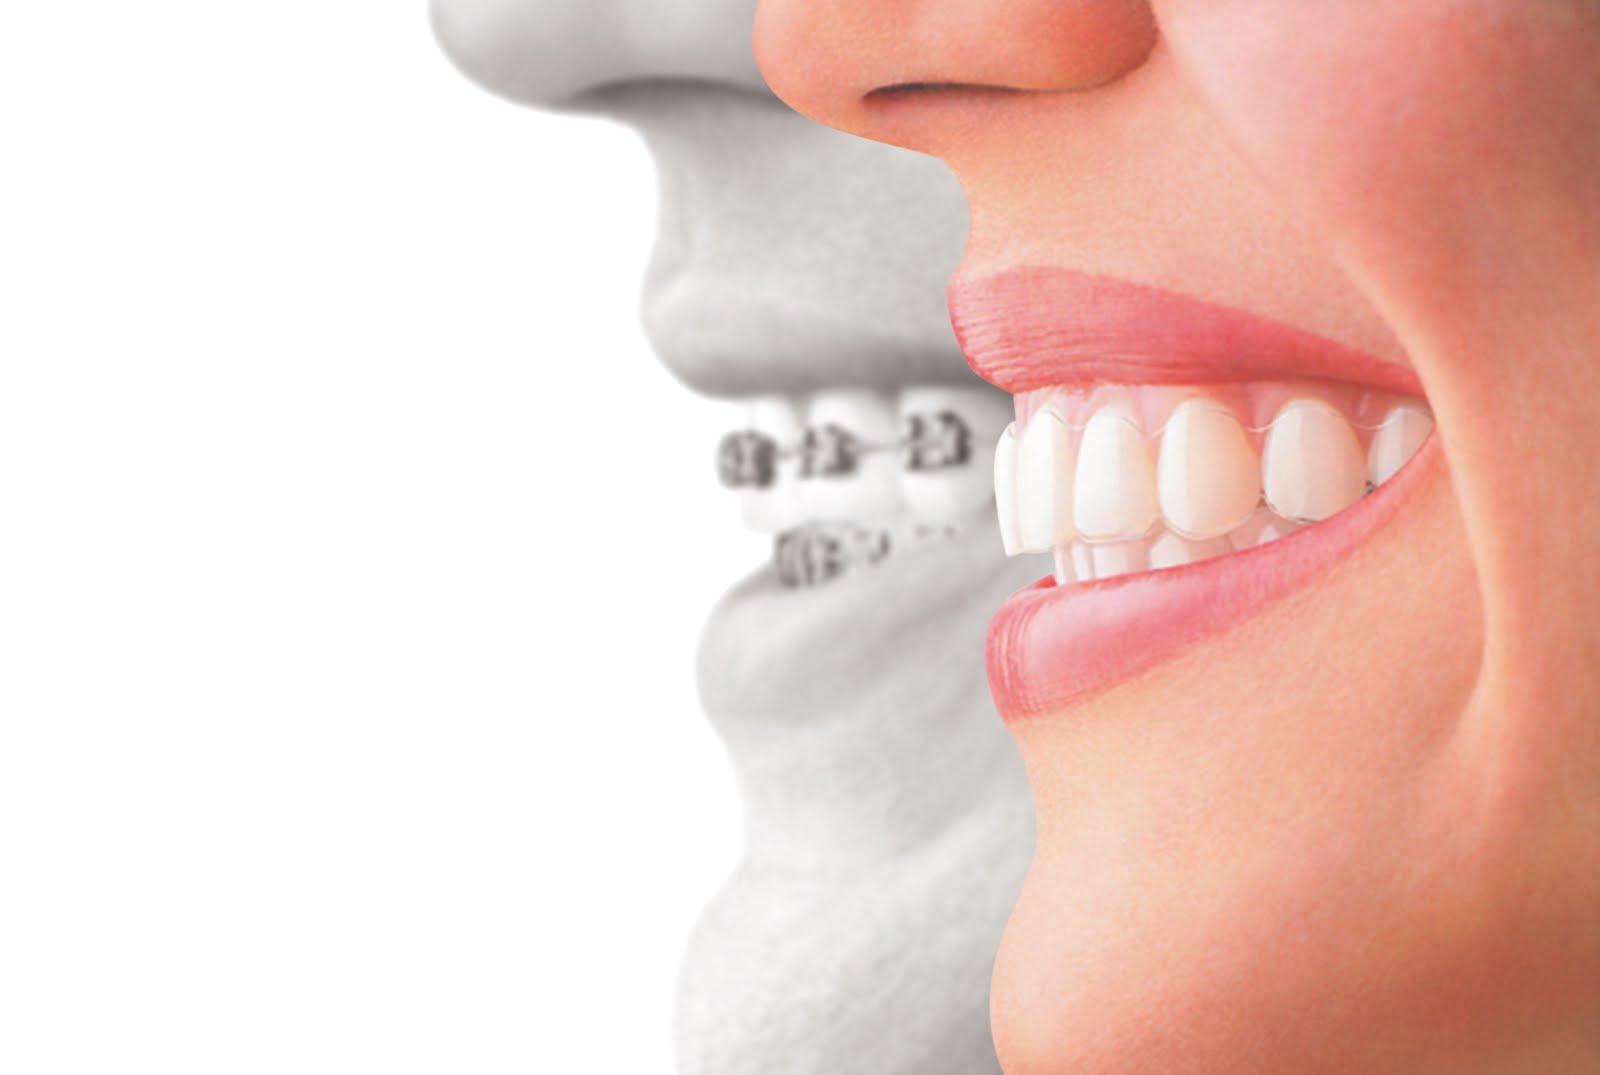 Orthodontics Bryan, Conroe, Humble, Huntsville, Lufkin, Spring, Tomball